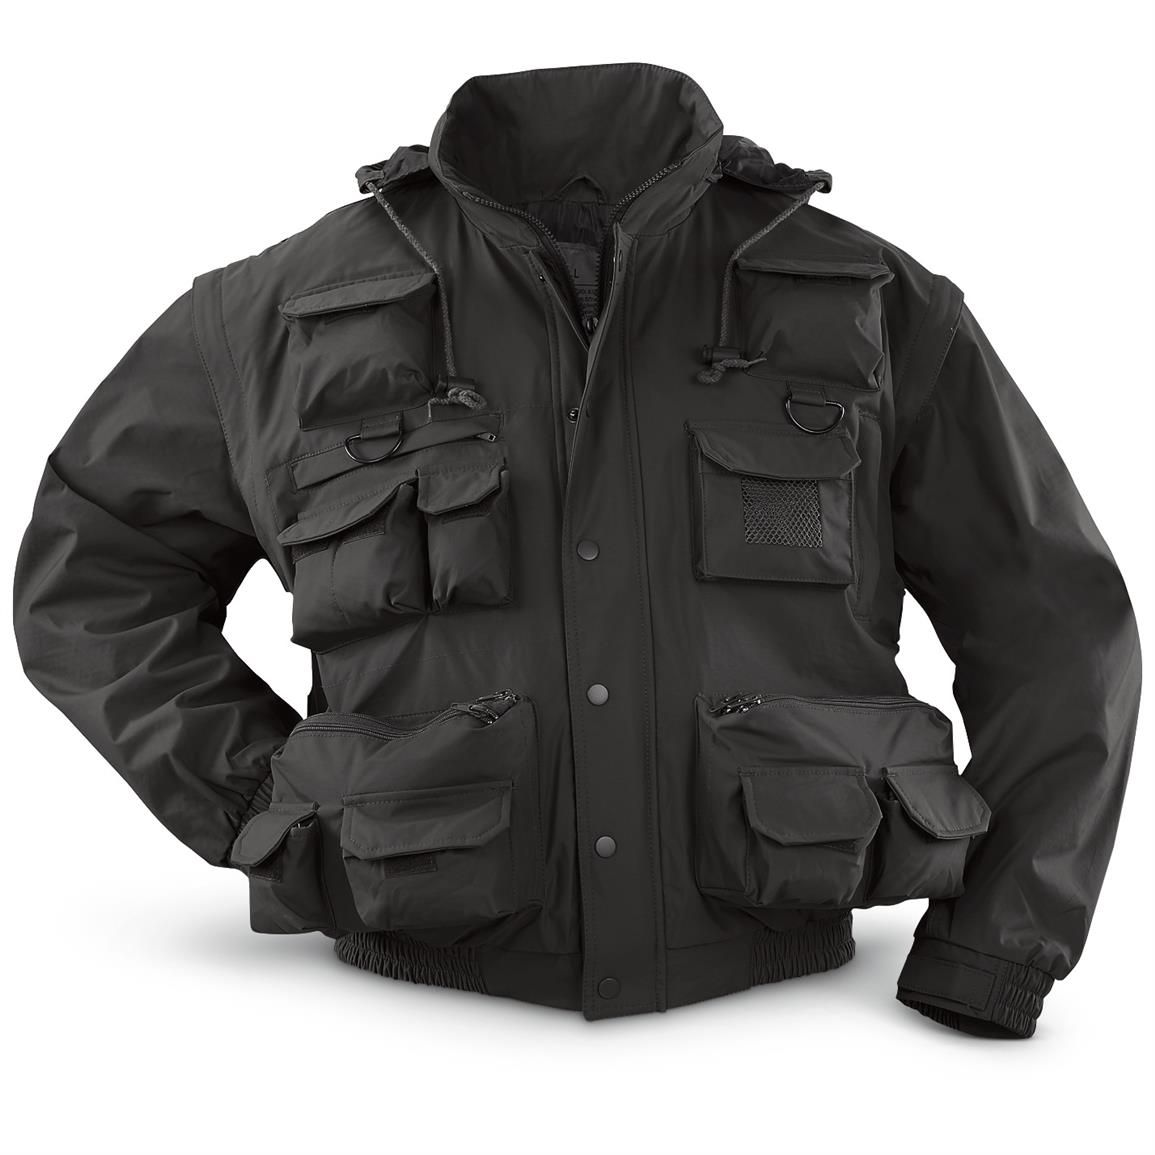 Tactical Duty Waterproof Windproof Jacket With Zip Off Sleeves Black 656124 Insulated Jackets Coats At Sportsma Windproof Jacket Tactical Jacket Jackets [ 1155 x 1155 Pixel ]